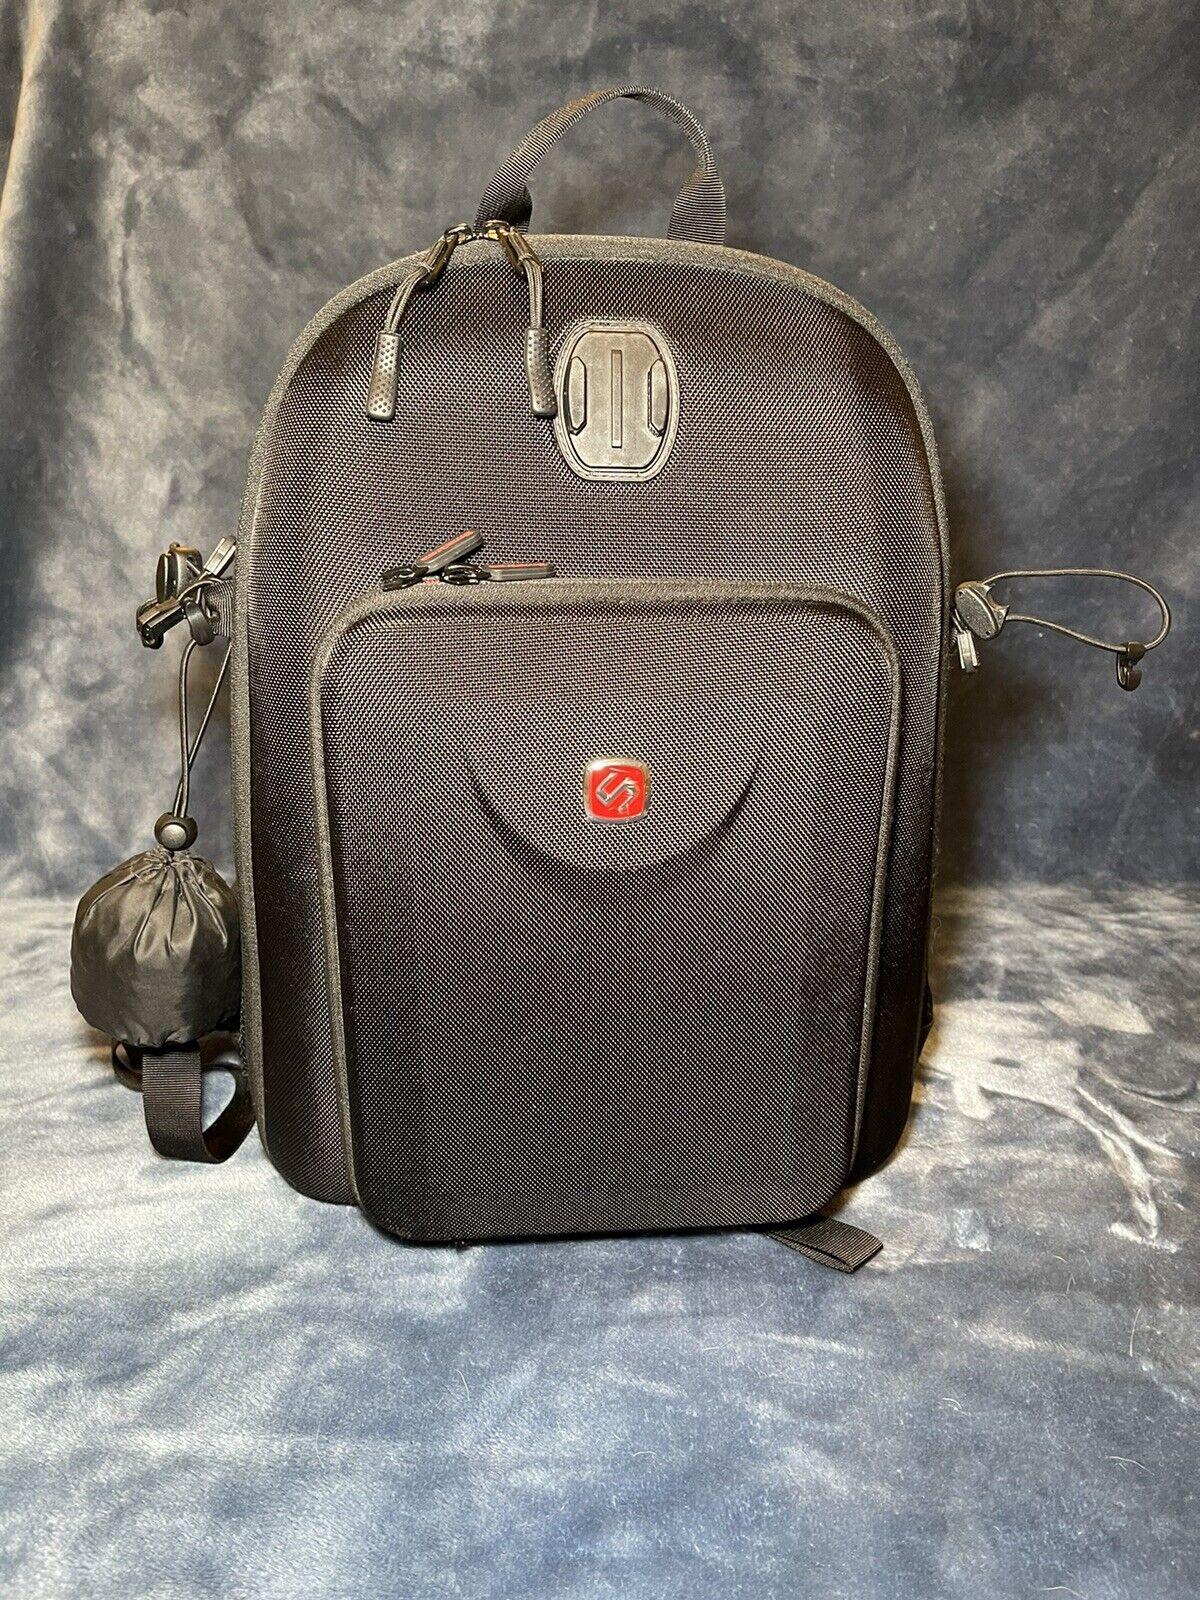 Hard Case Drone / Go Pro Backpack